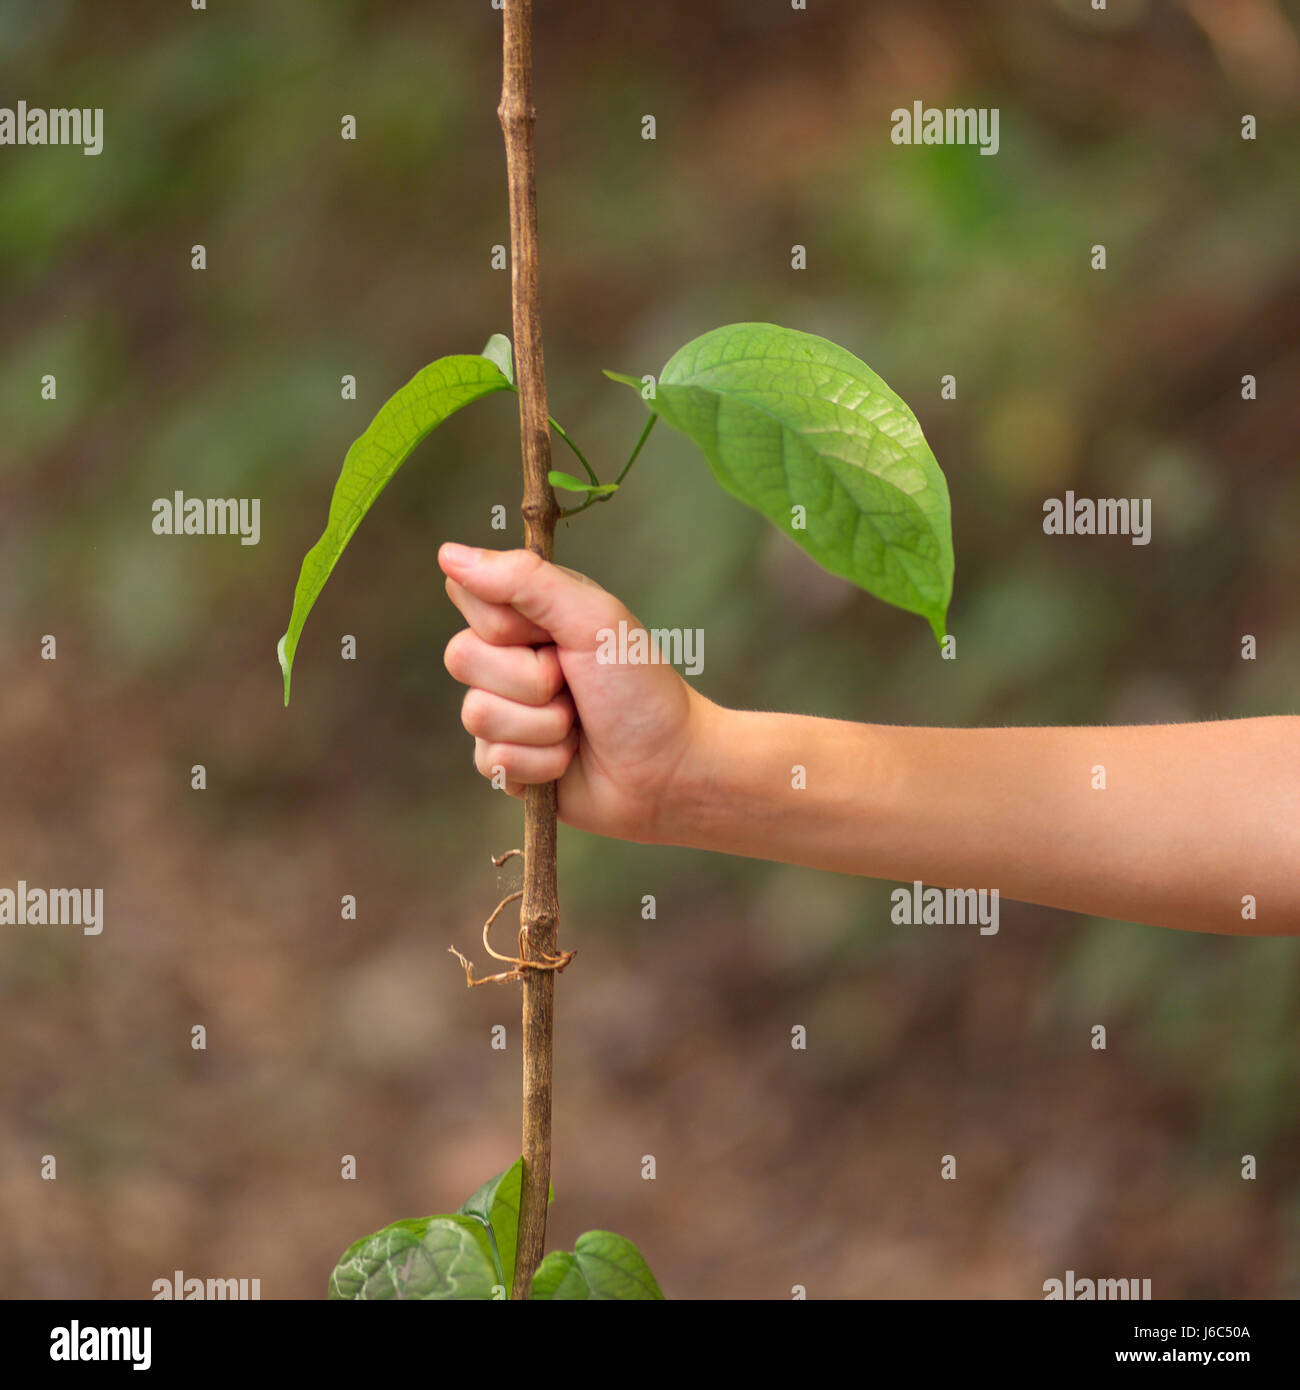 hand hands leaf leaves central america sticks hold grab grasp stalk stem limbs Stock Photo